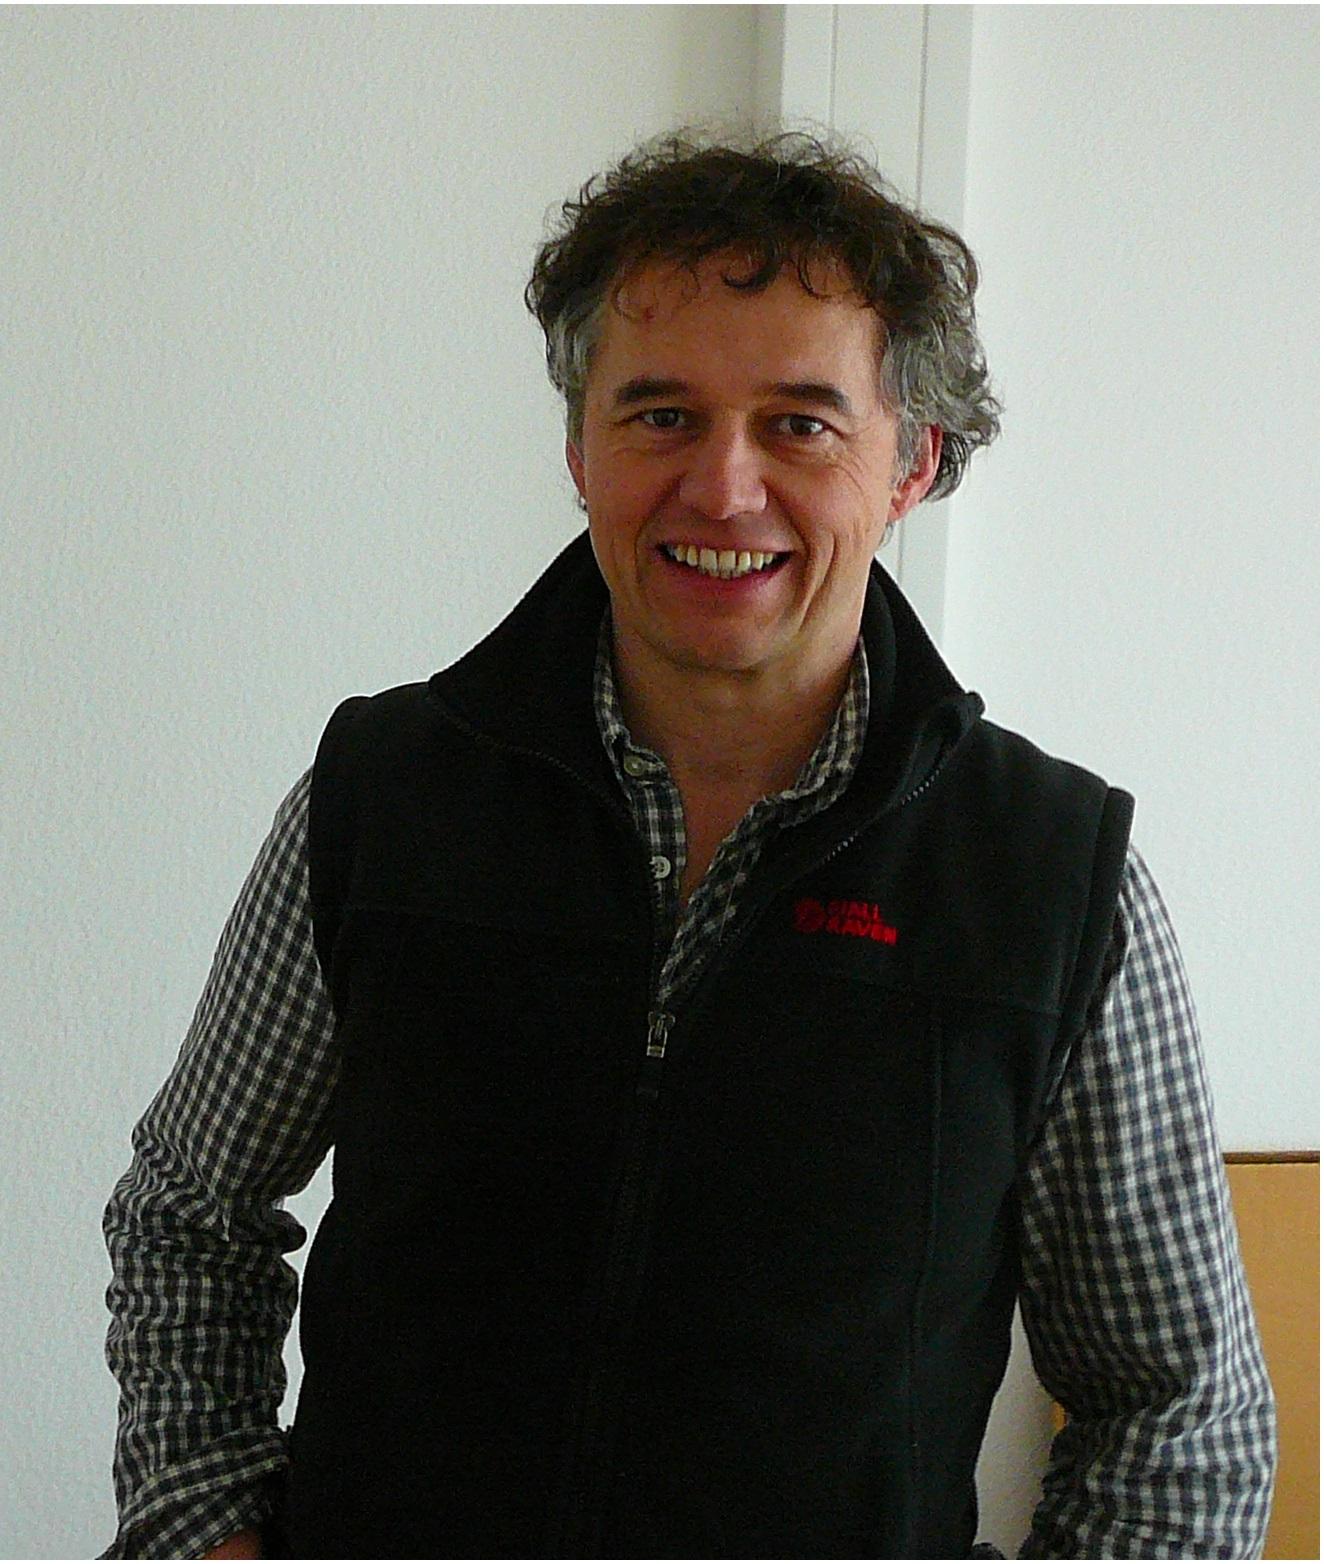 Franz Elender